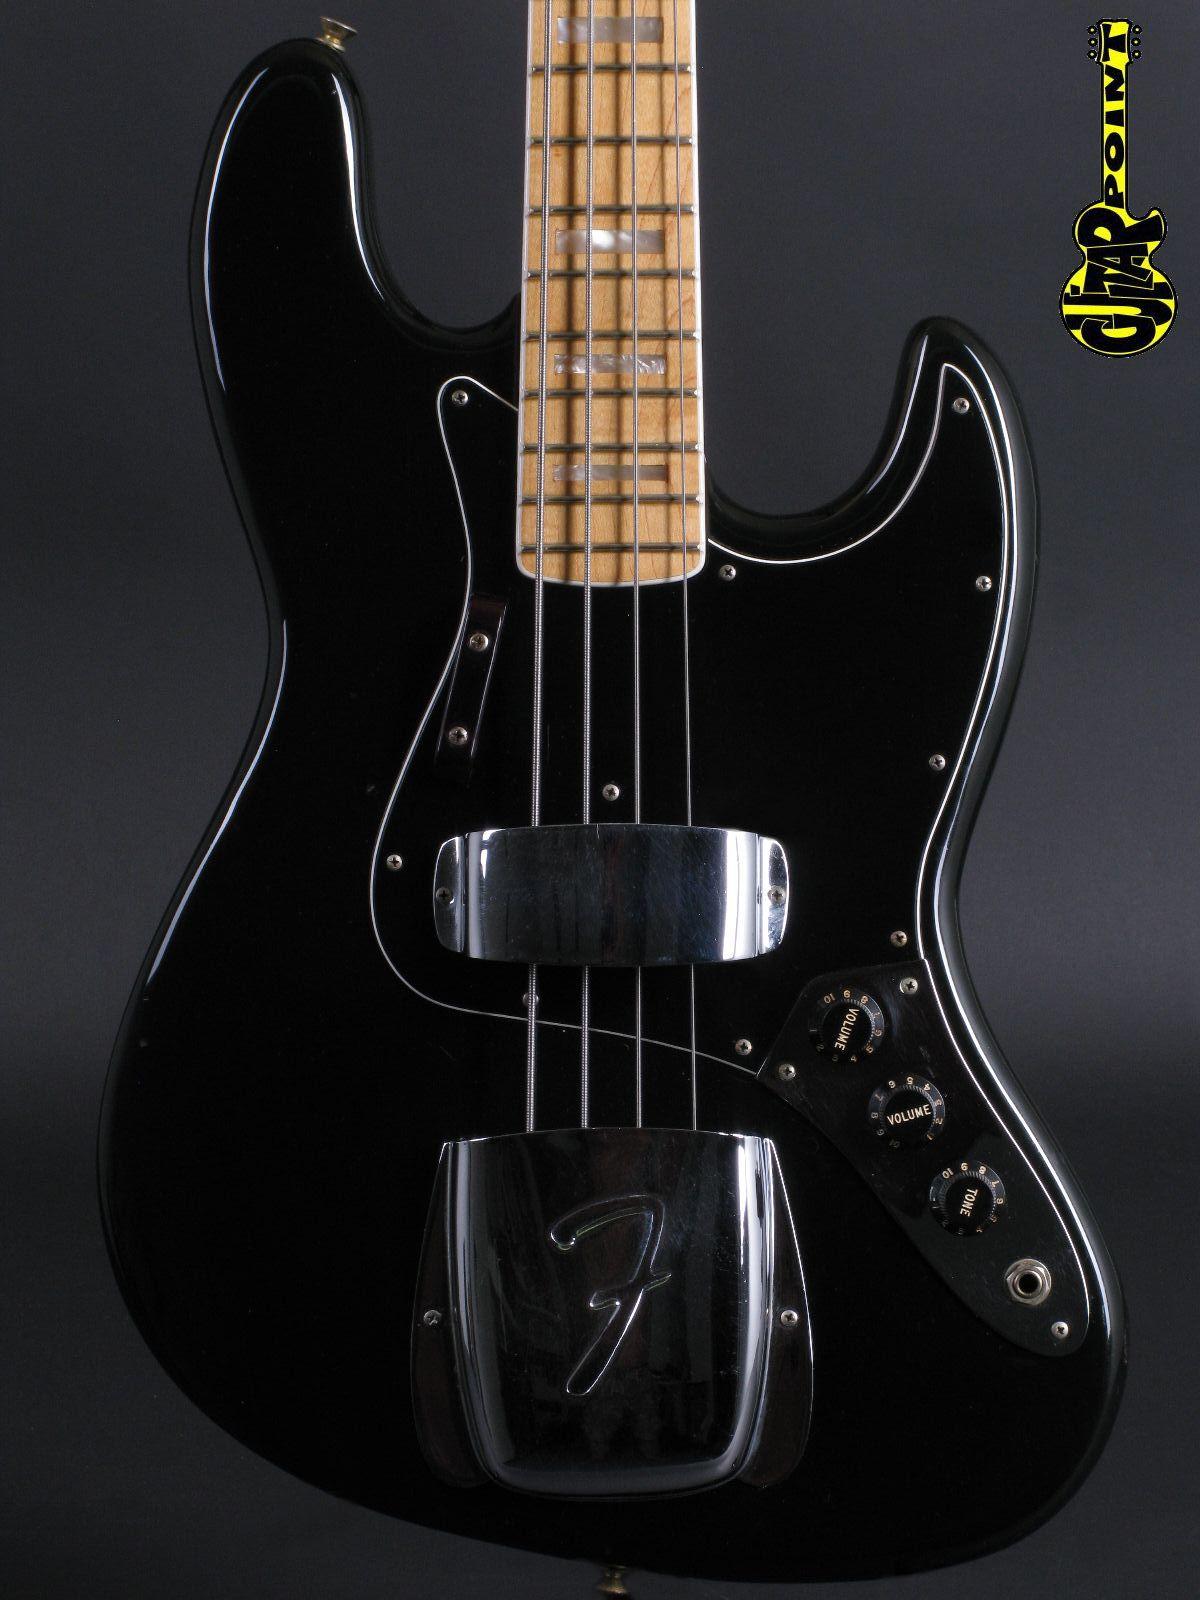 1977 Fender Jazz Bass - Black